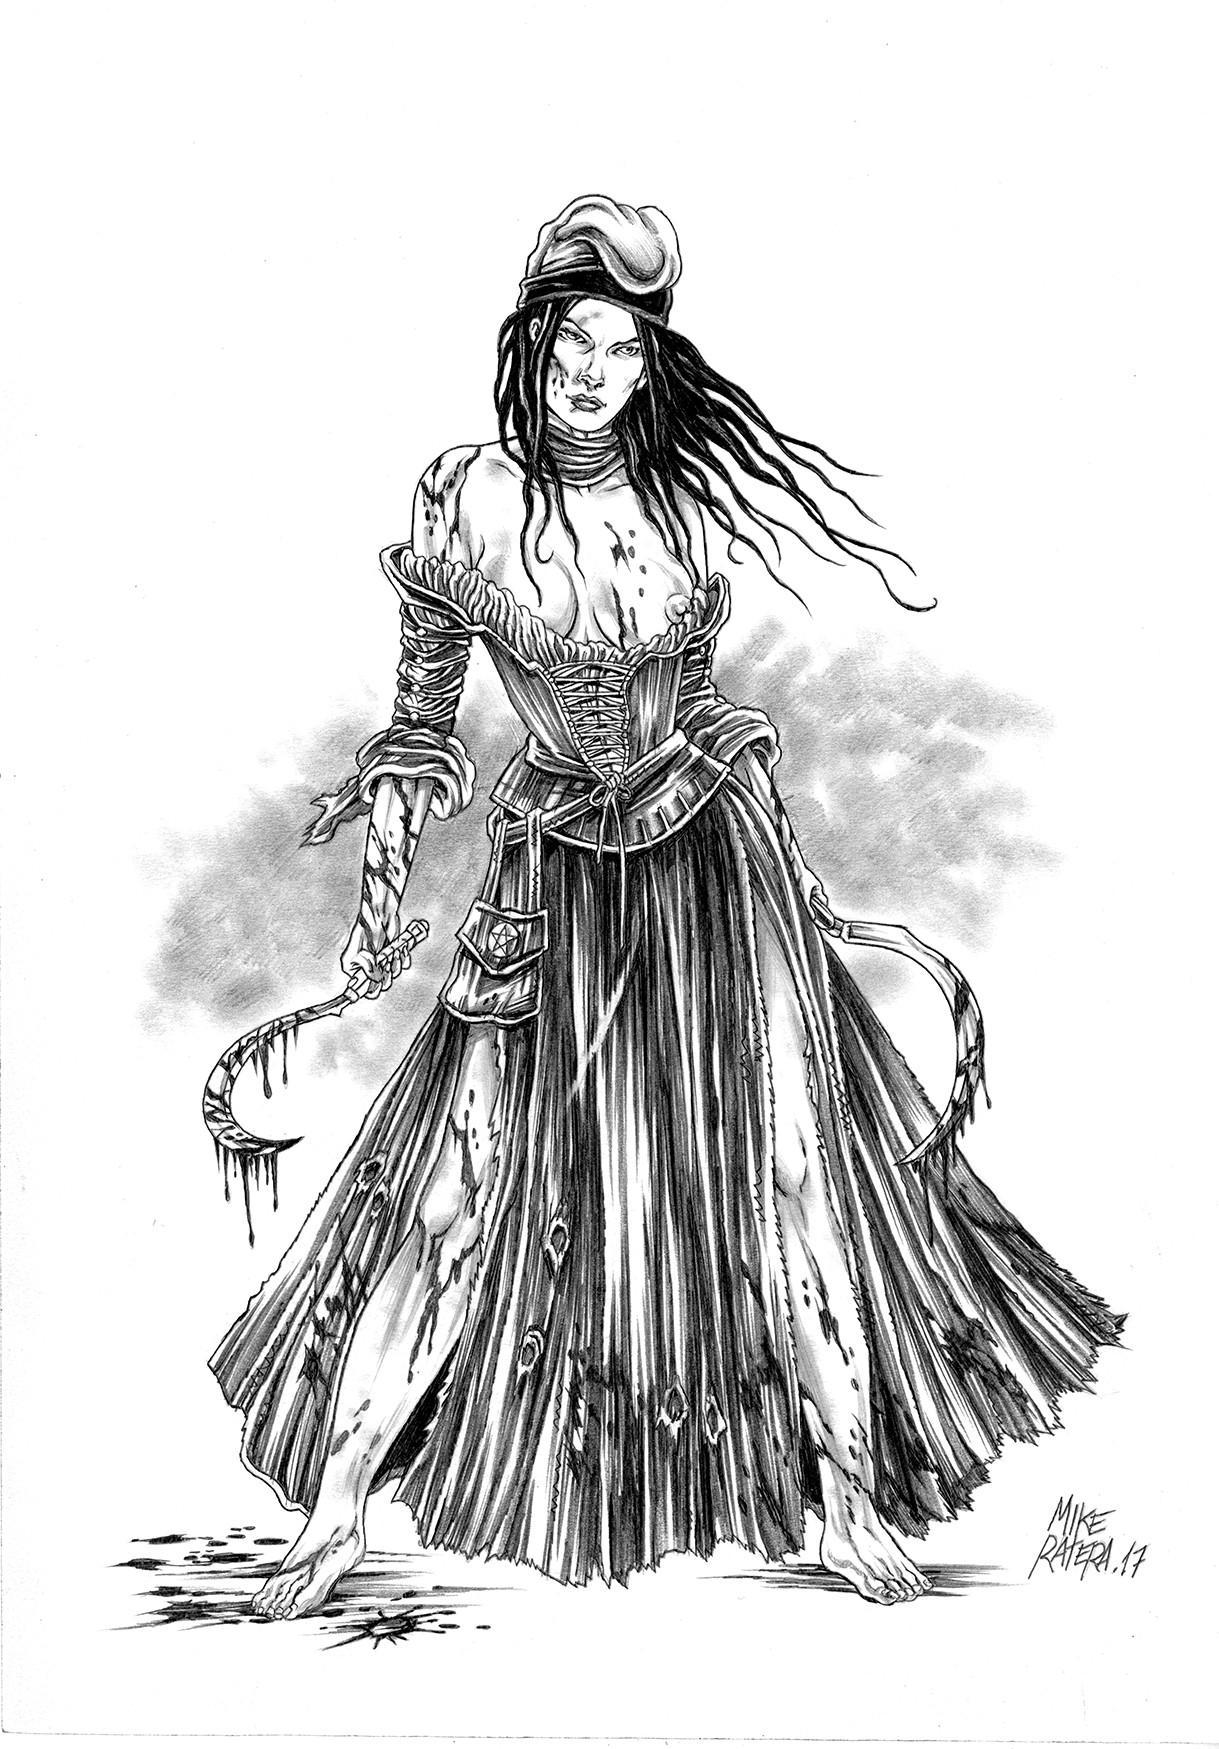 Mike ratera segadors reaper girl concept 3c